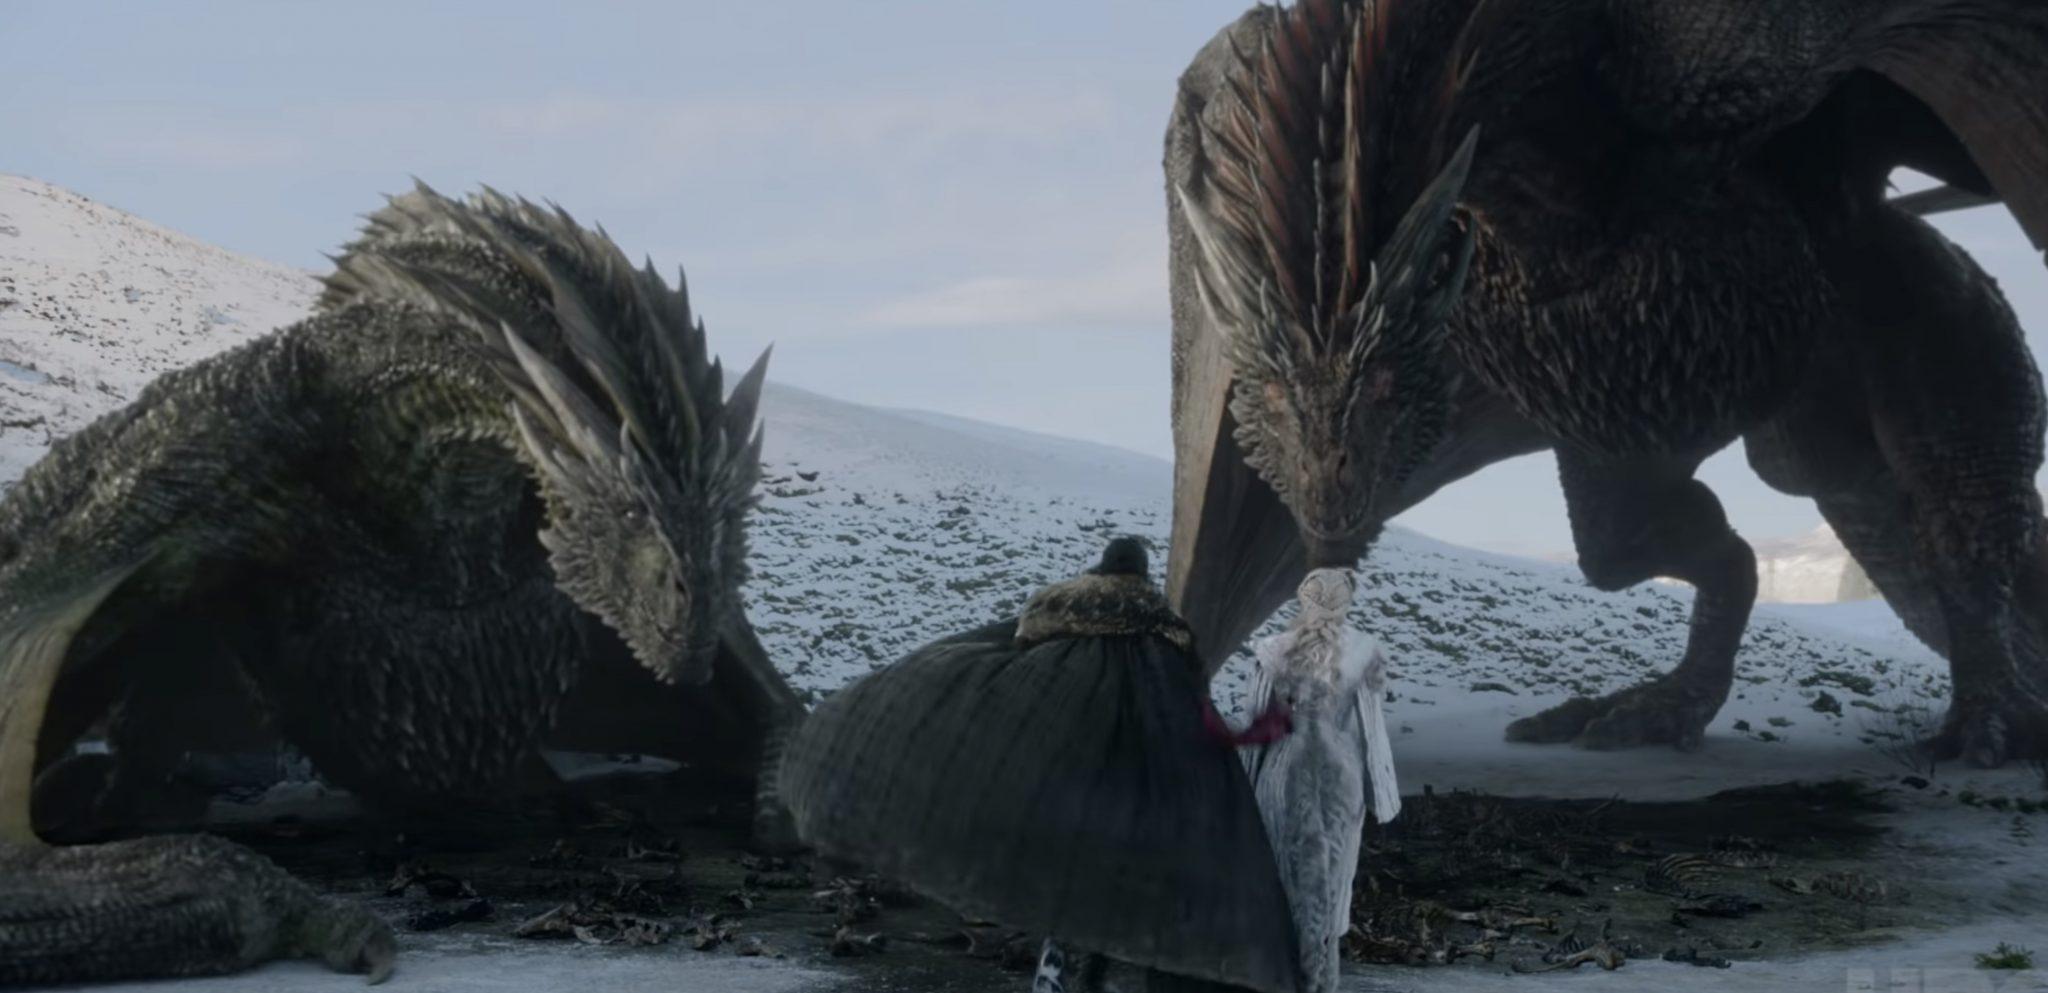 Game of Thrones Prequel-https://youtu.be/rlR4PJn8b8I